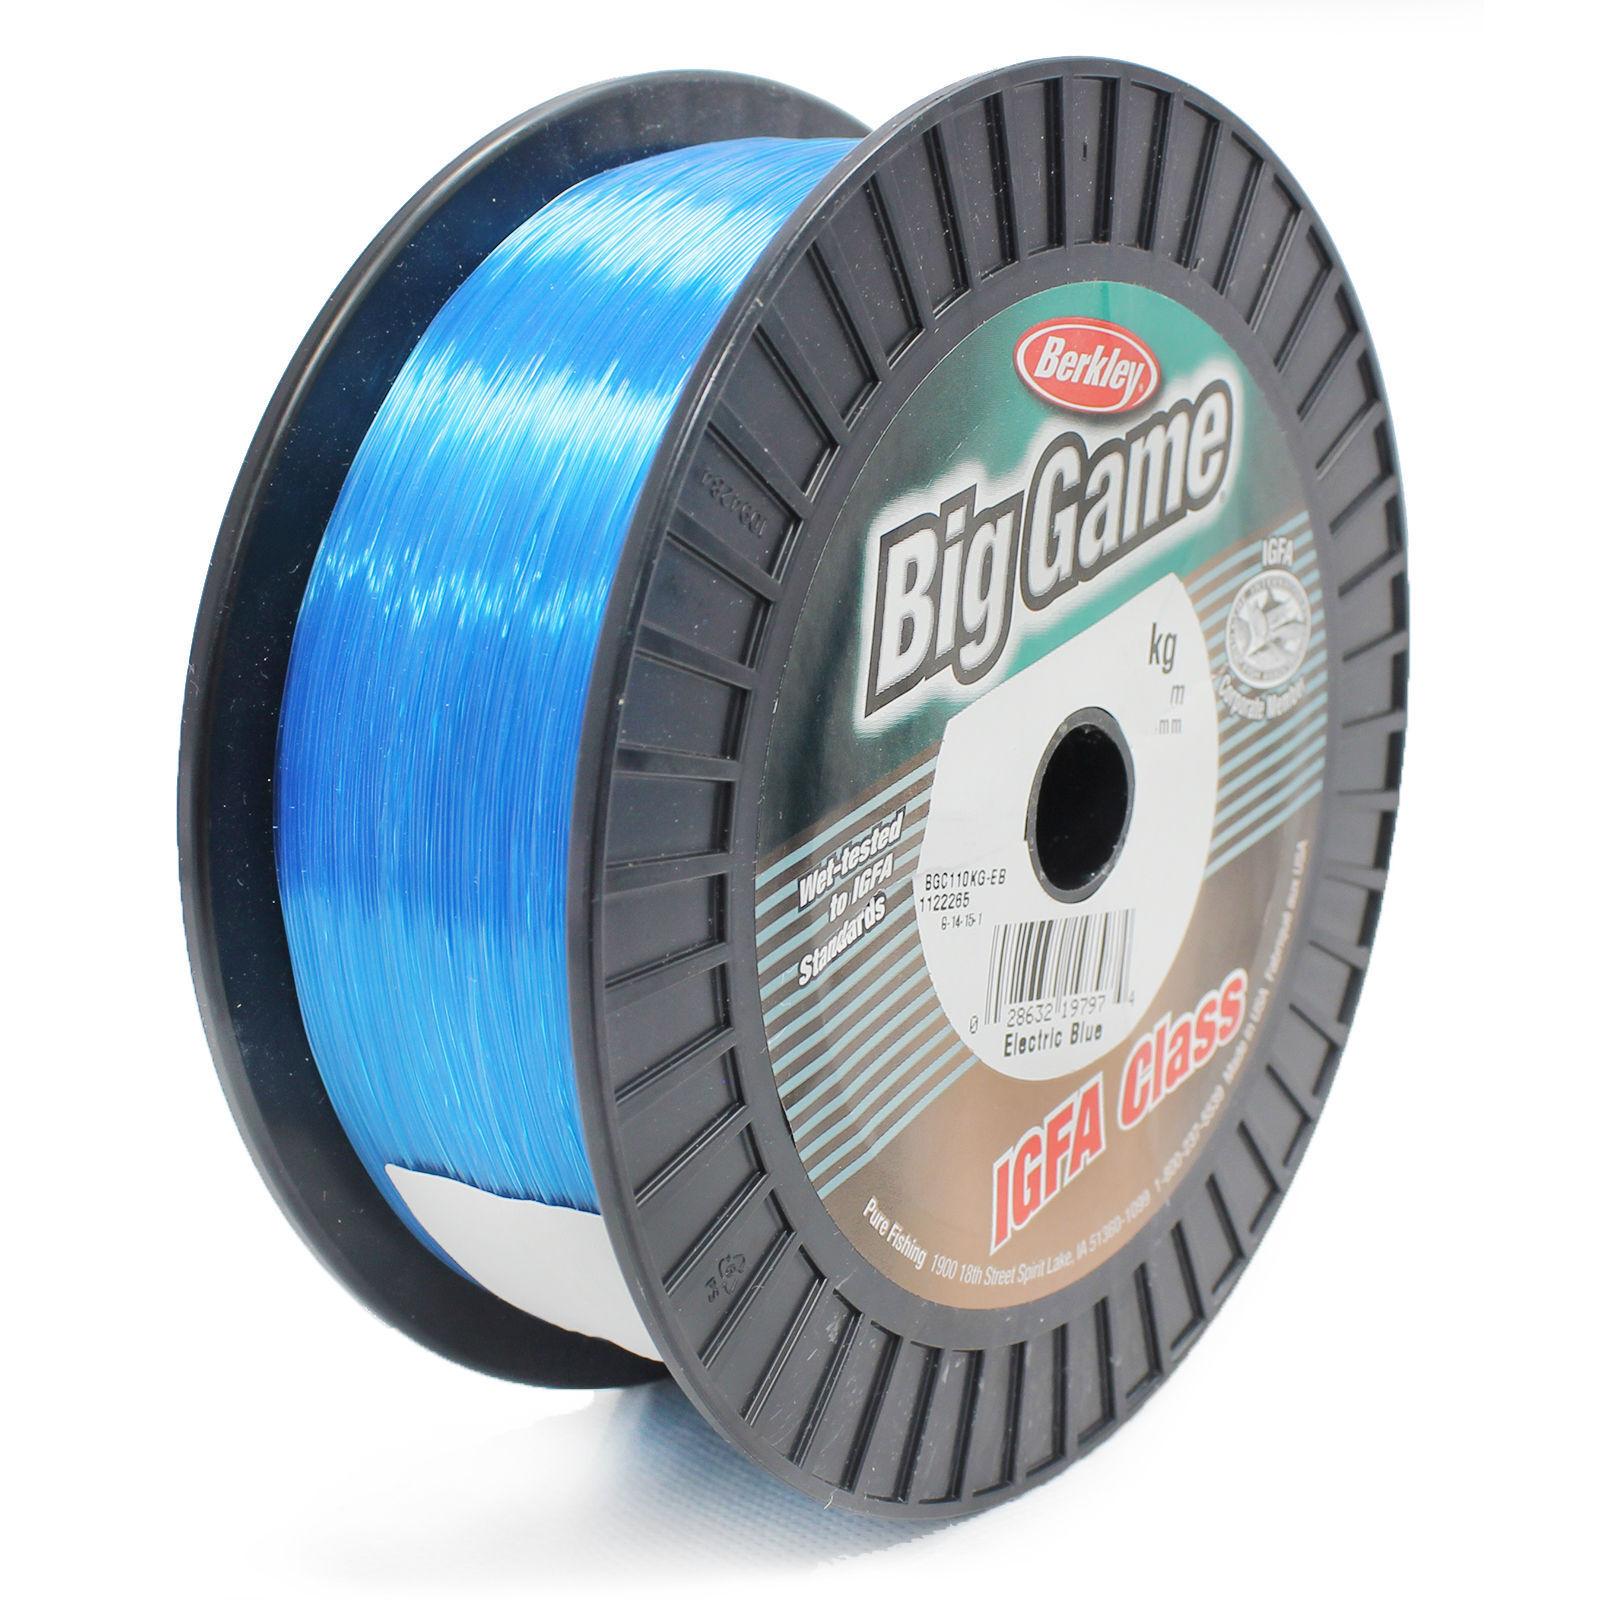 BERKLEY BIG GAME IGFA Bulk Spool Fishing Line  bluee 600 m - 24 kg - 0.71mm  the best online store offer